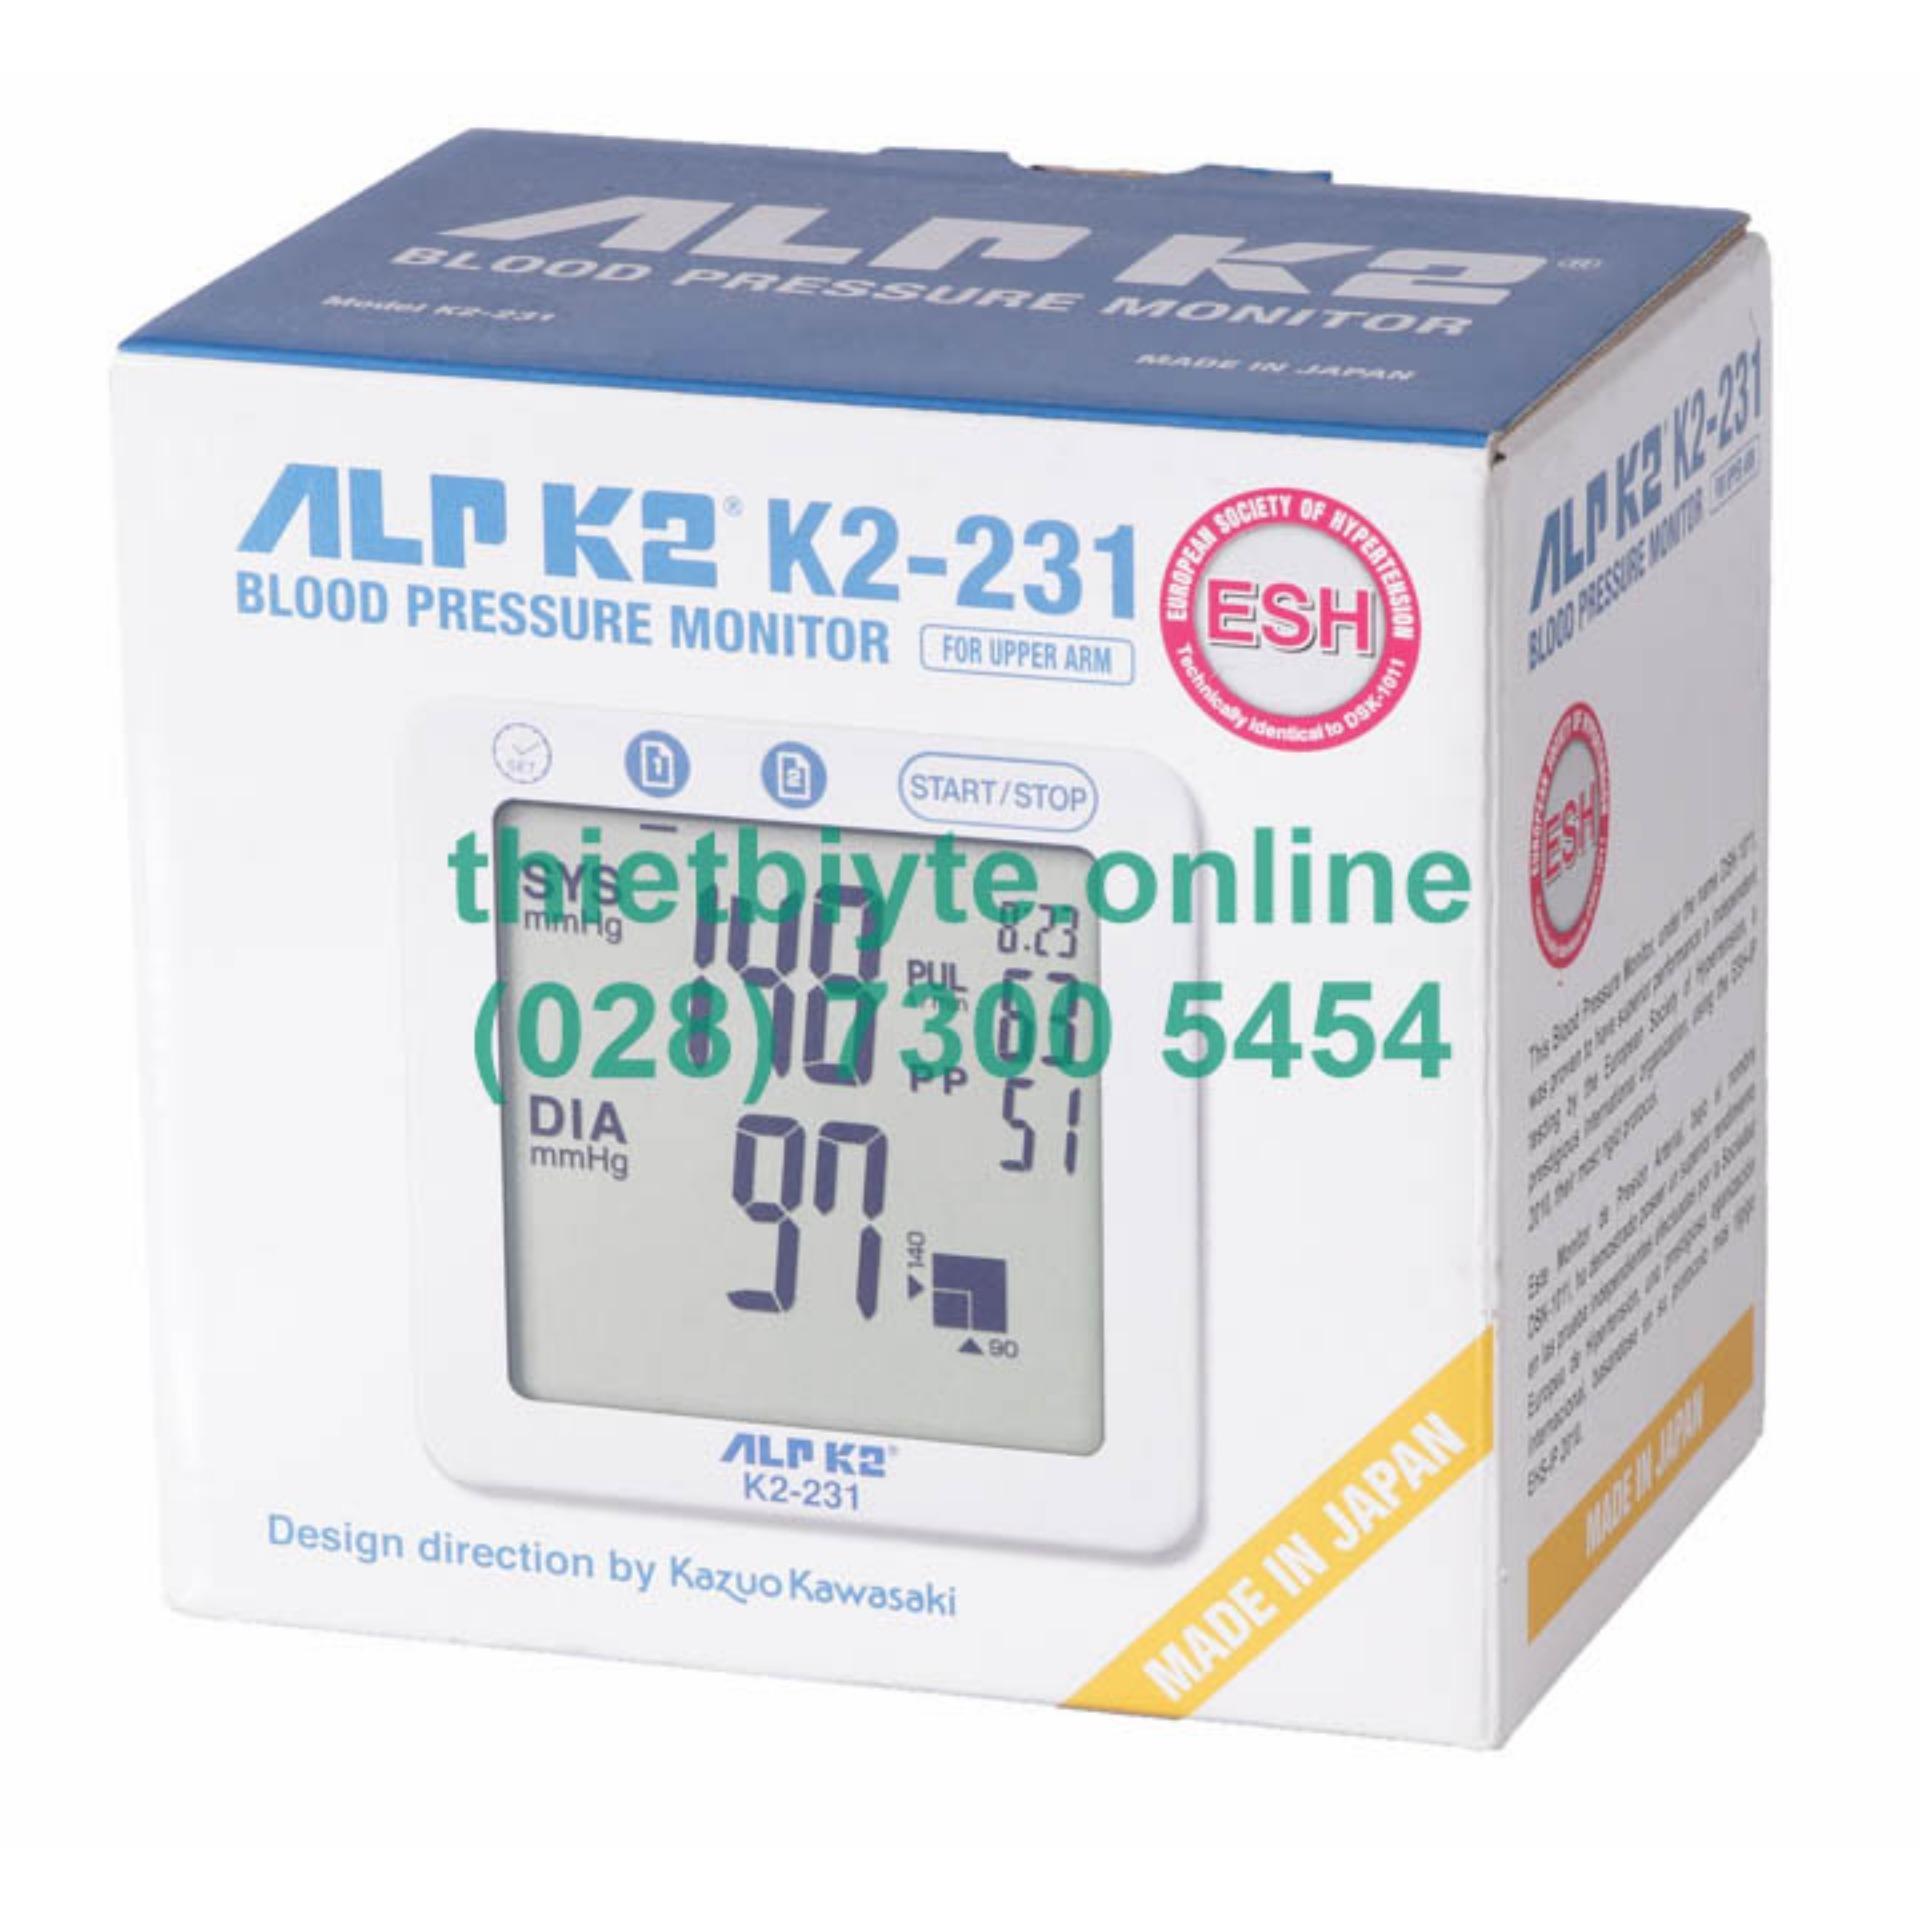 Nơi bán Máy đo huyết áp bắp tay Alpk2 K2-231